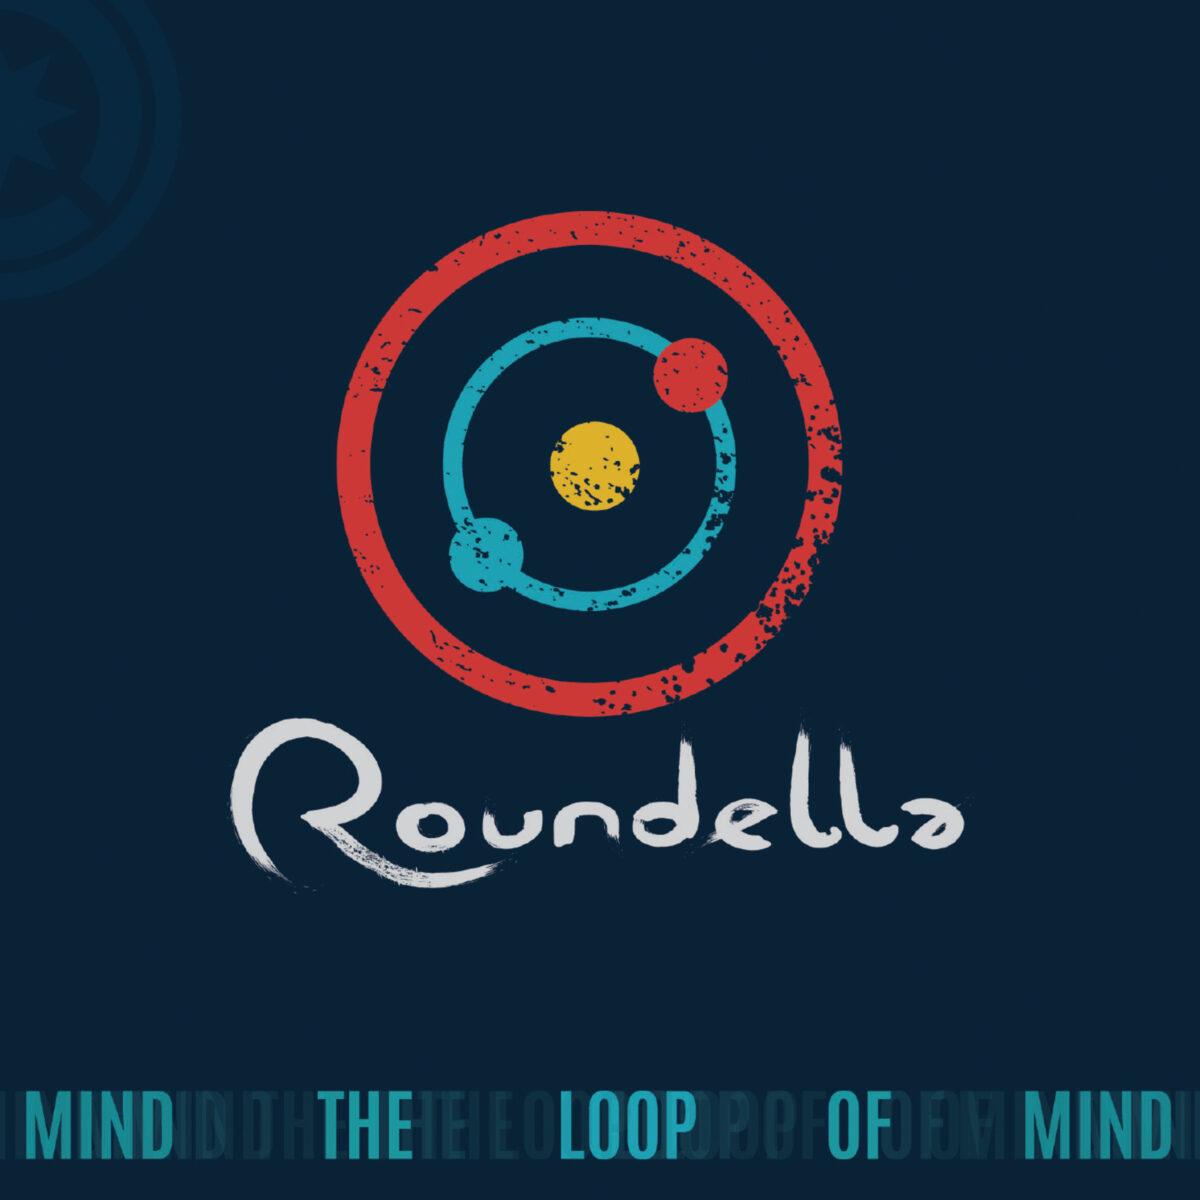 Roundella - Mind The Loop Of Mind - S'Ard Music - Egea Music - Spotify - ascolti - album - 2021 - Sa Scena - 26 febbraio 2021